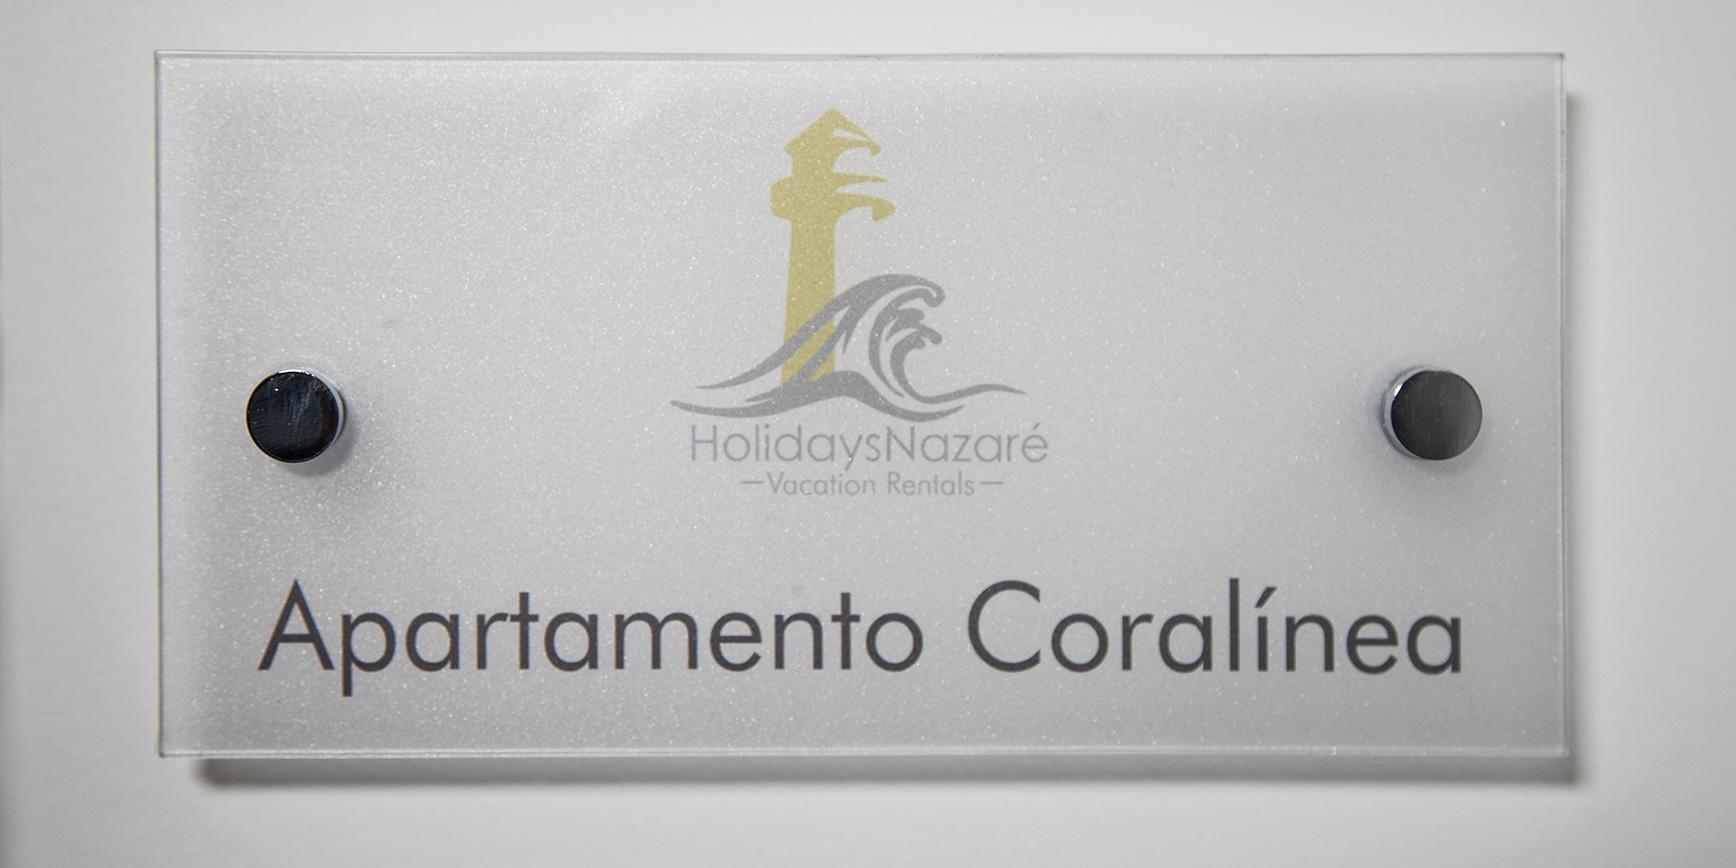 Apartamento Coralinea